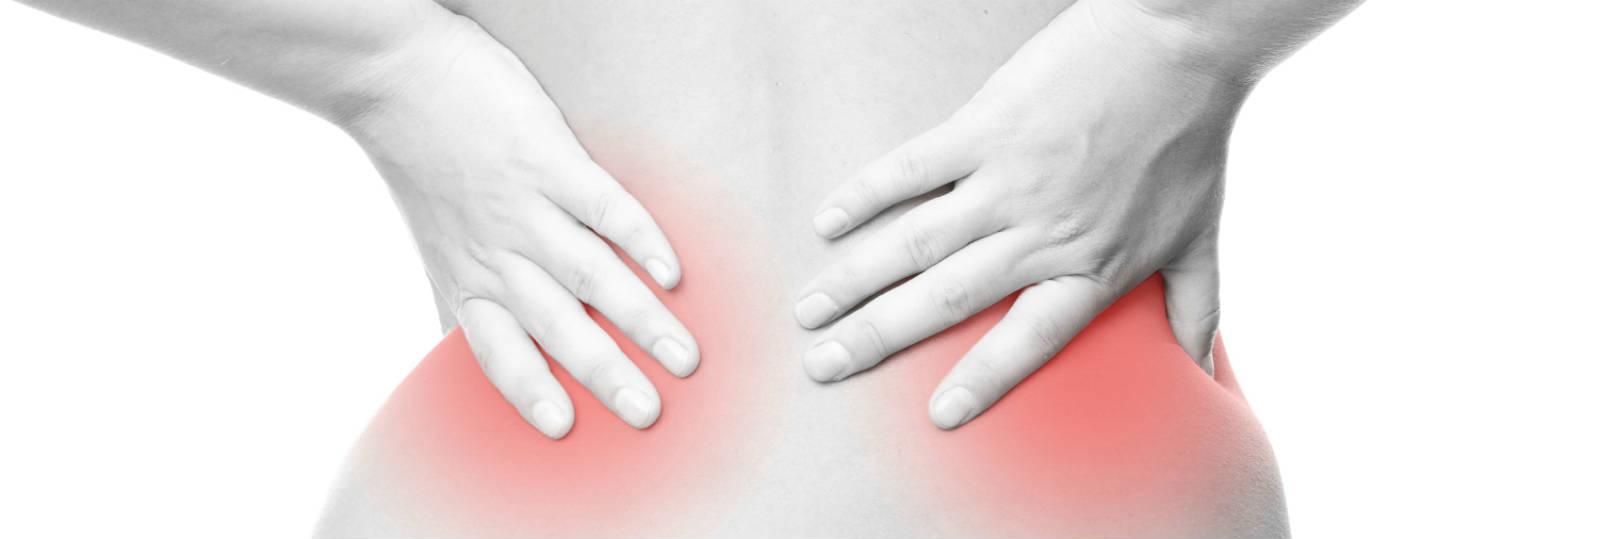 sciatica dolore soluzione cura studio shiatsu annalisa bachmann bra cuneo torino rimedio malesseri medicina naturale .jpg